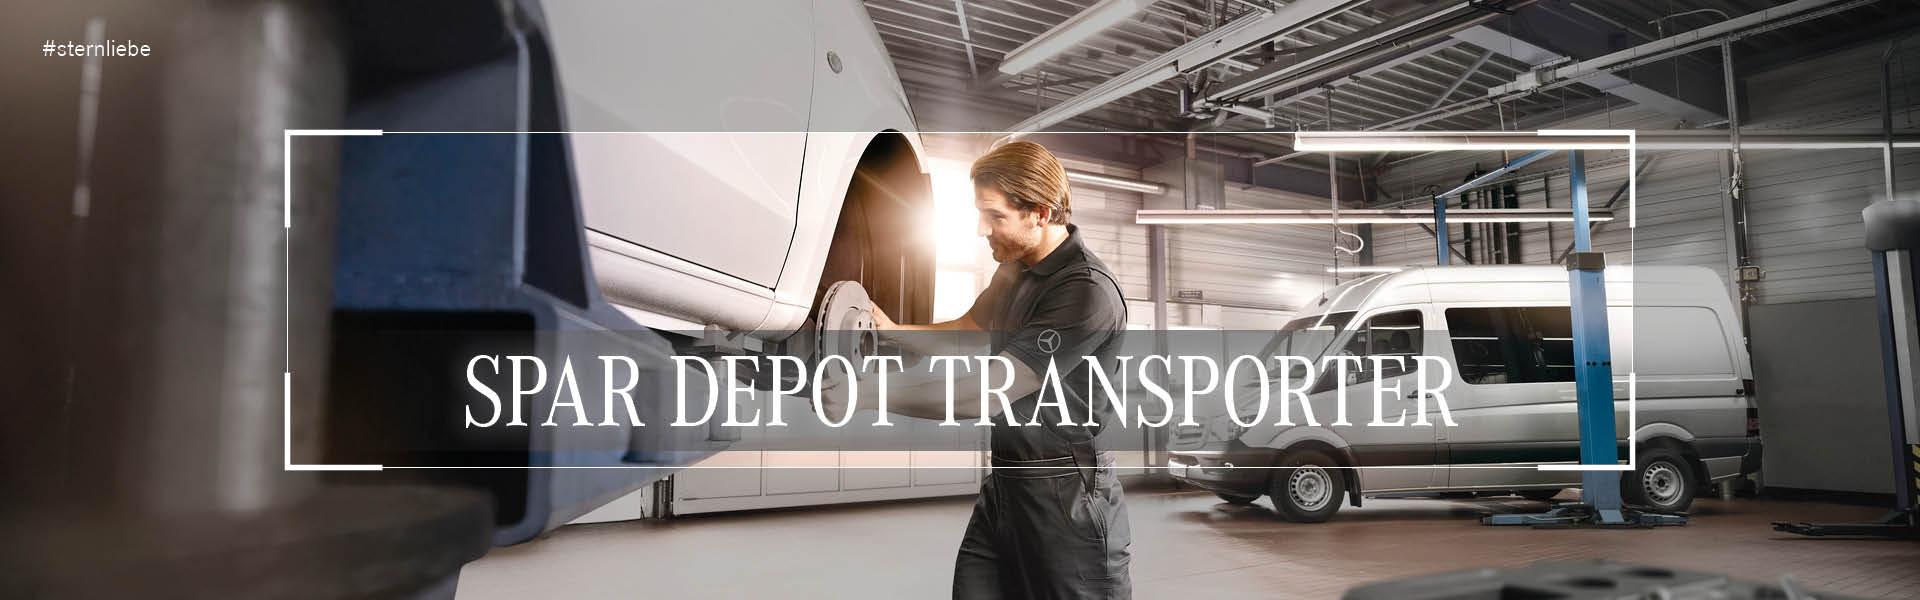 PARDepotTransporter Mercedes Benz Brinkmann